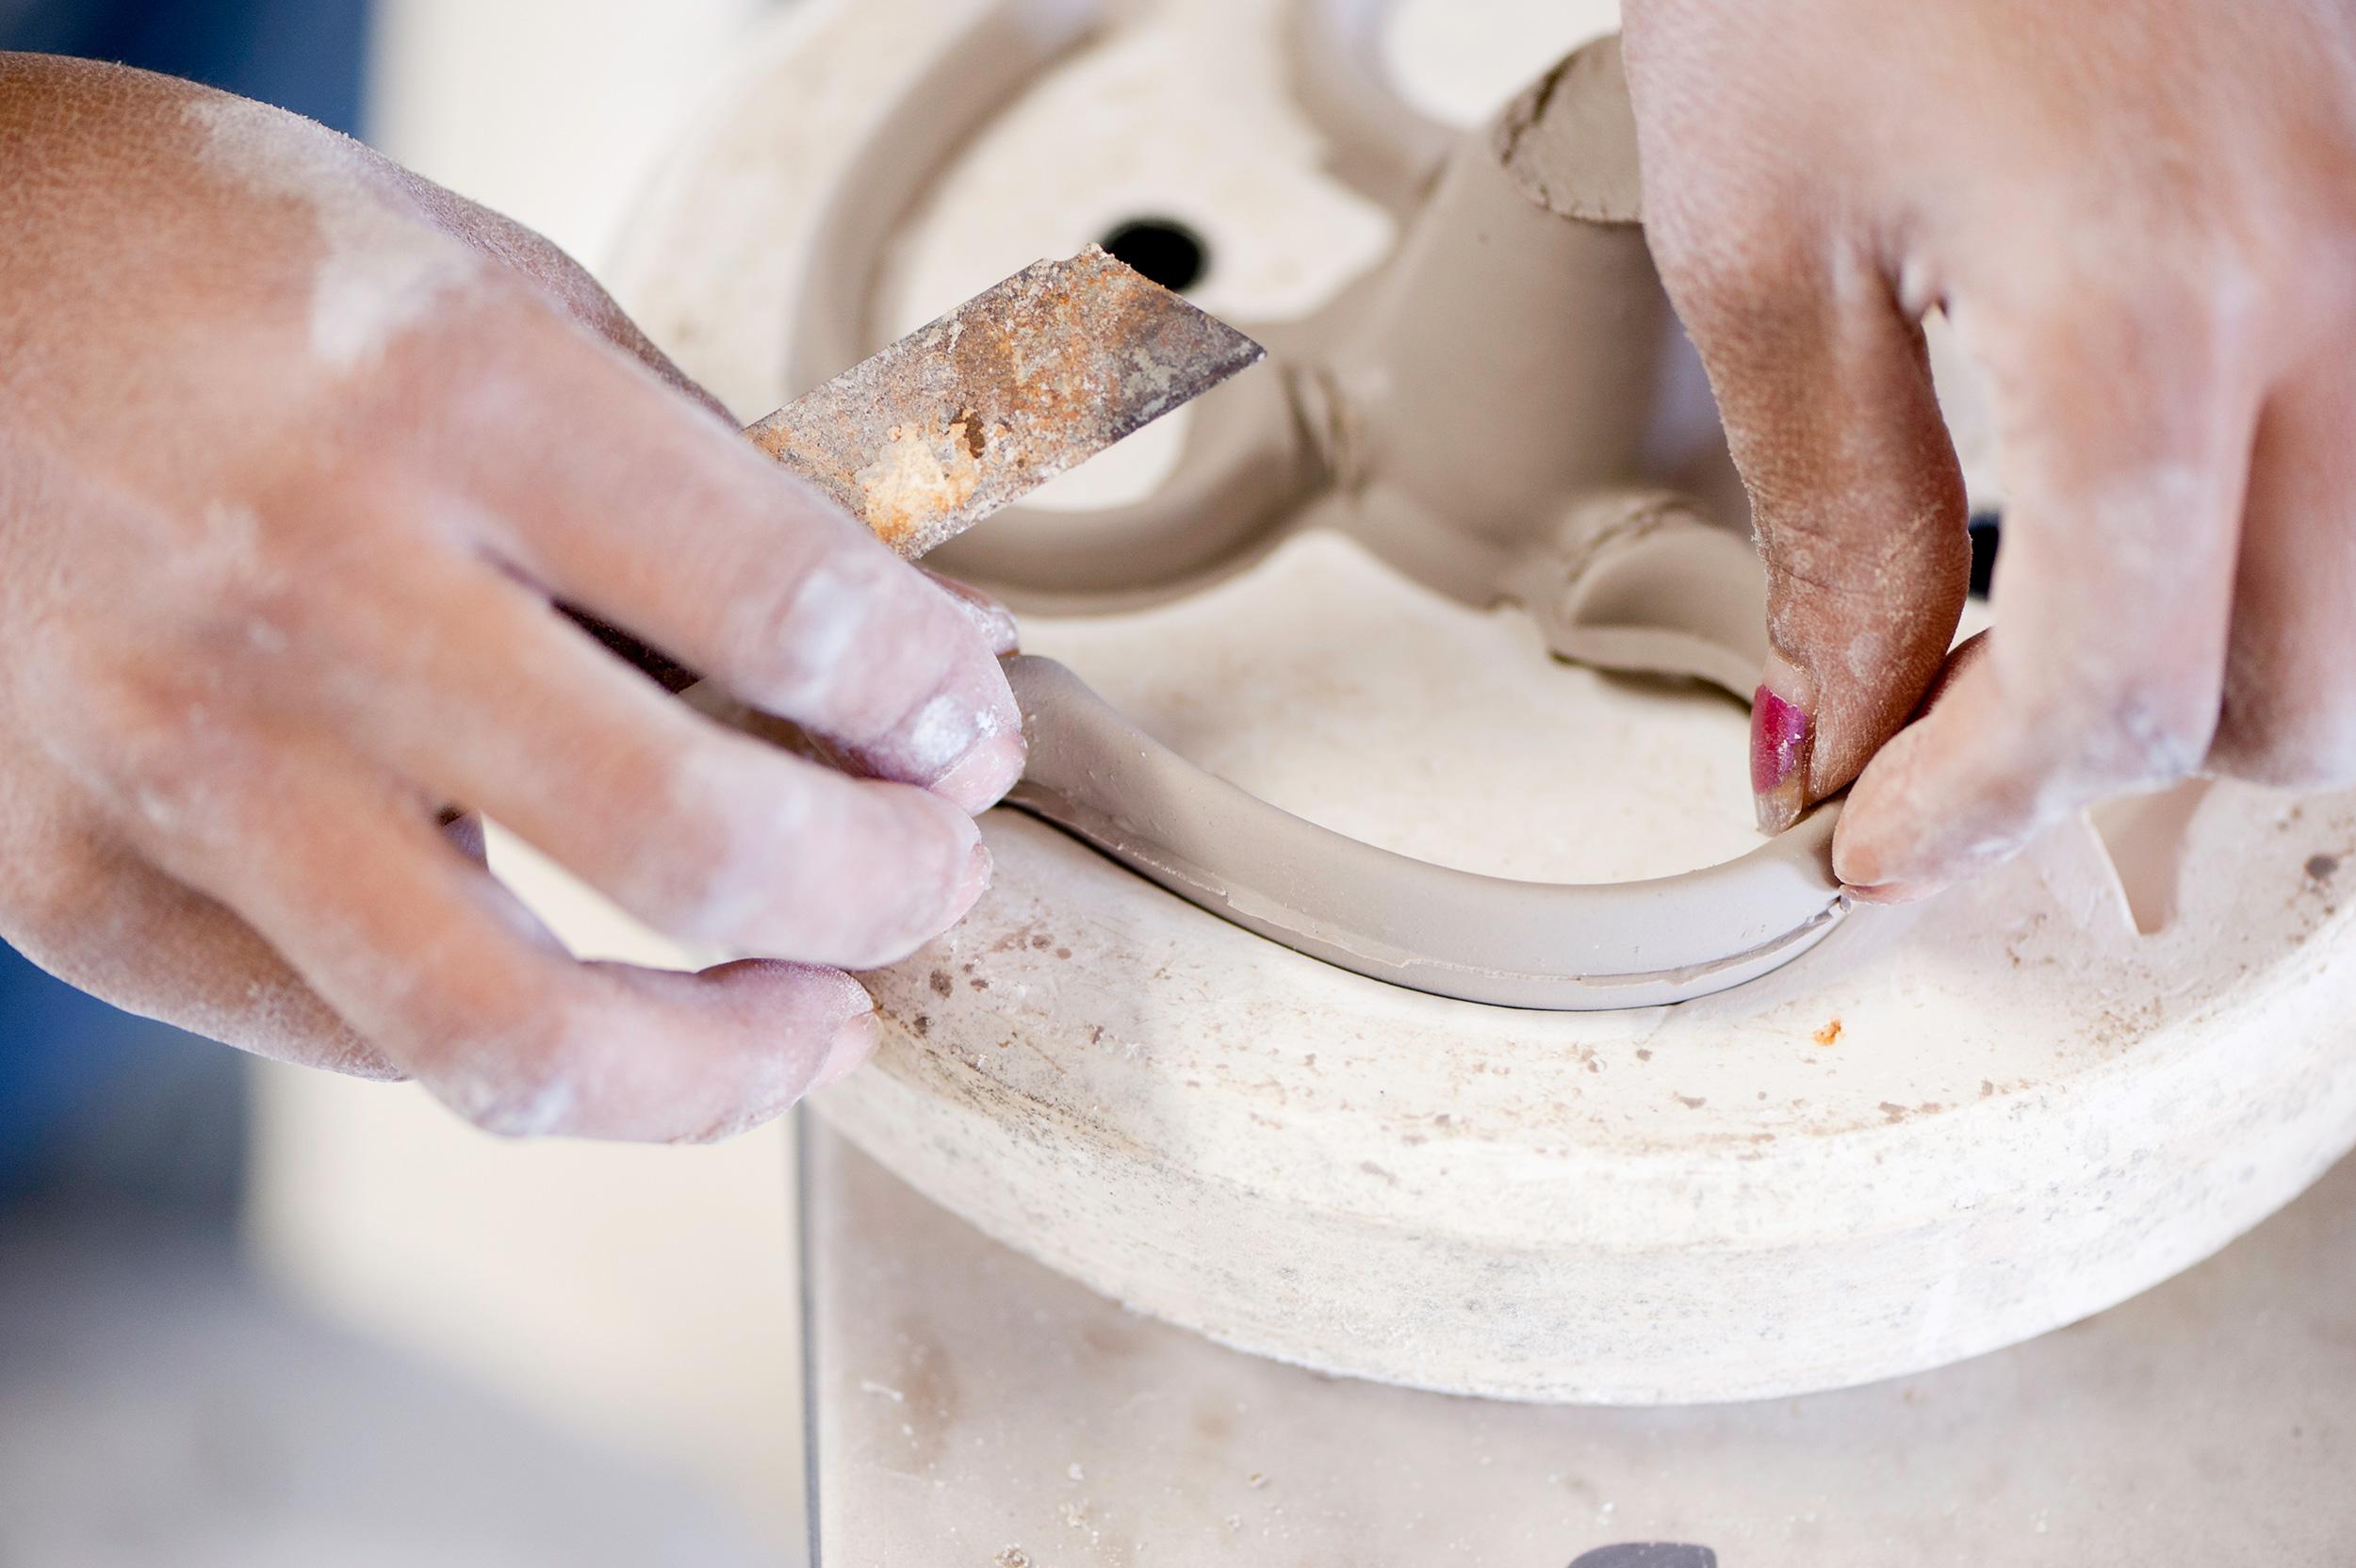 kapula-handmade-ceramics-manufacturing-process.jpg